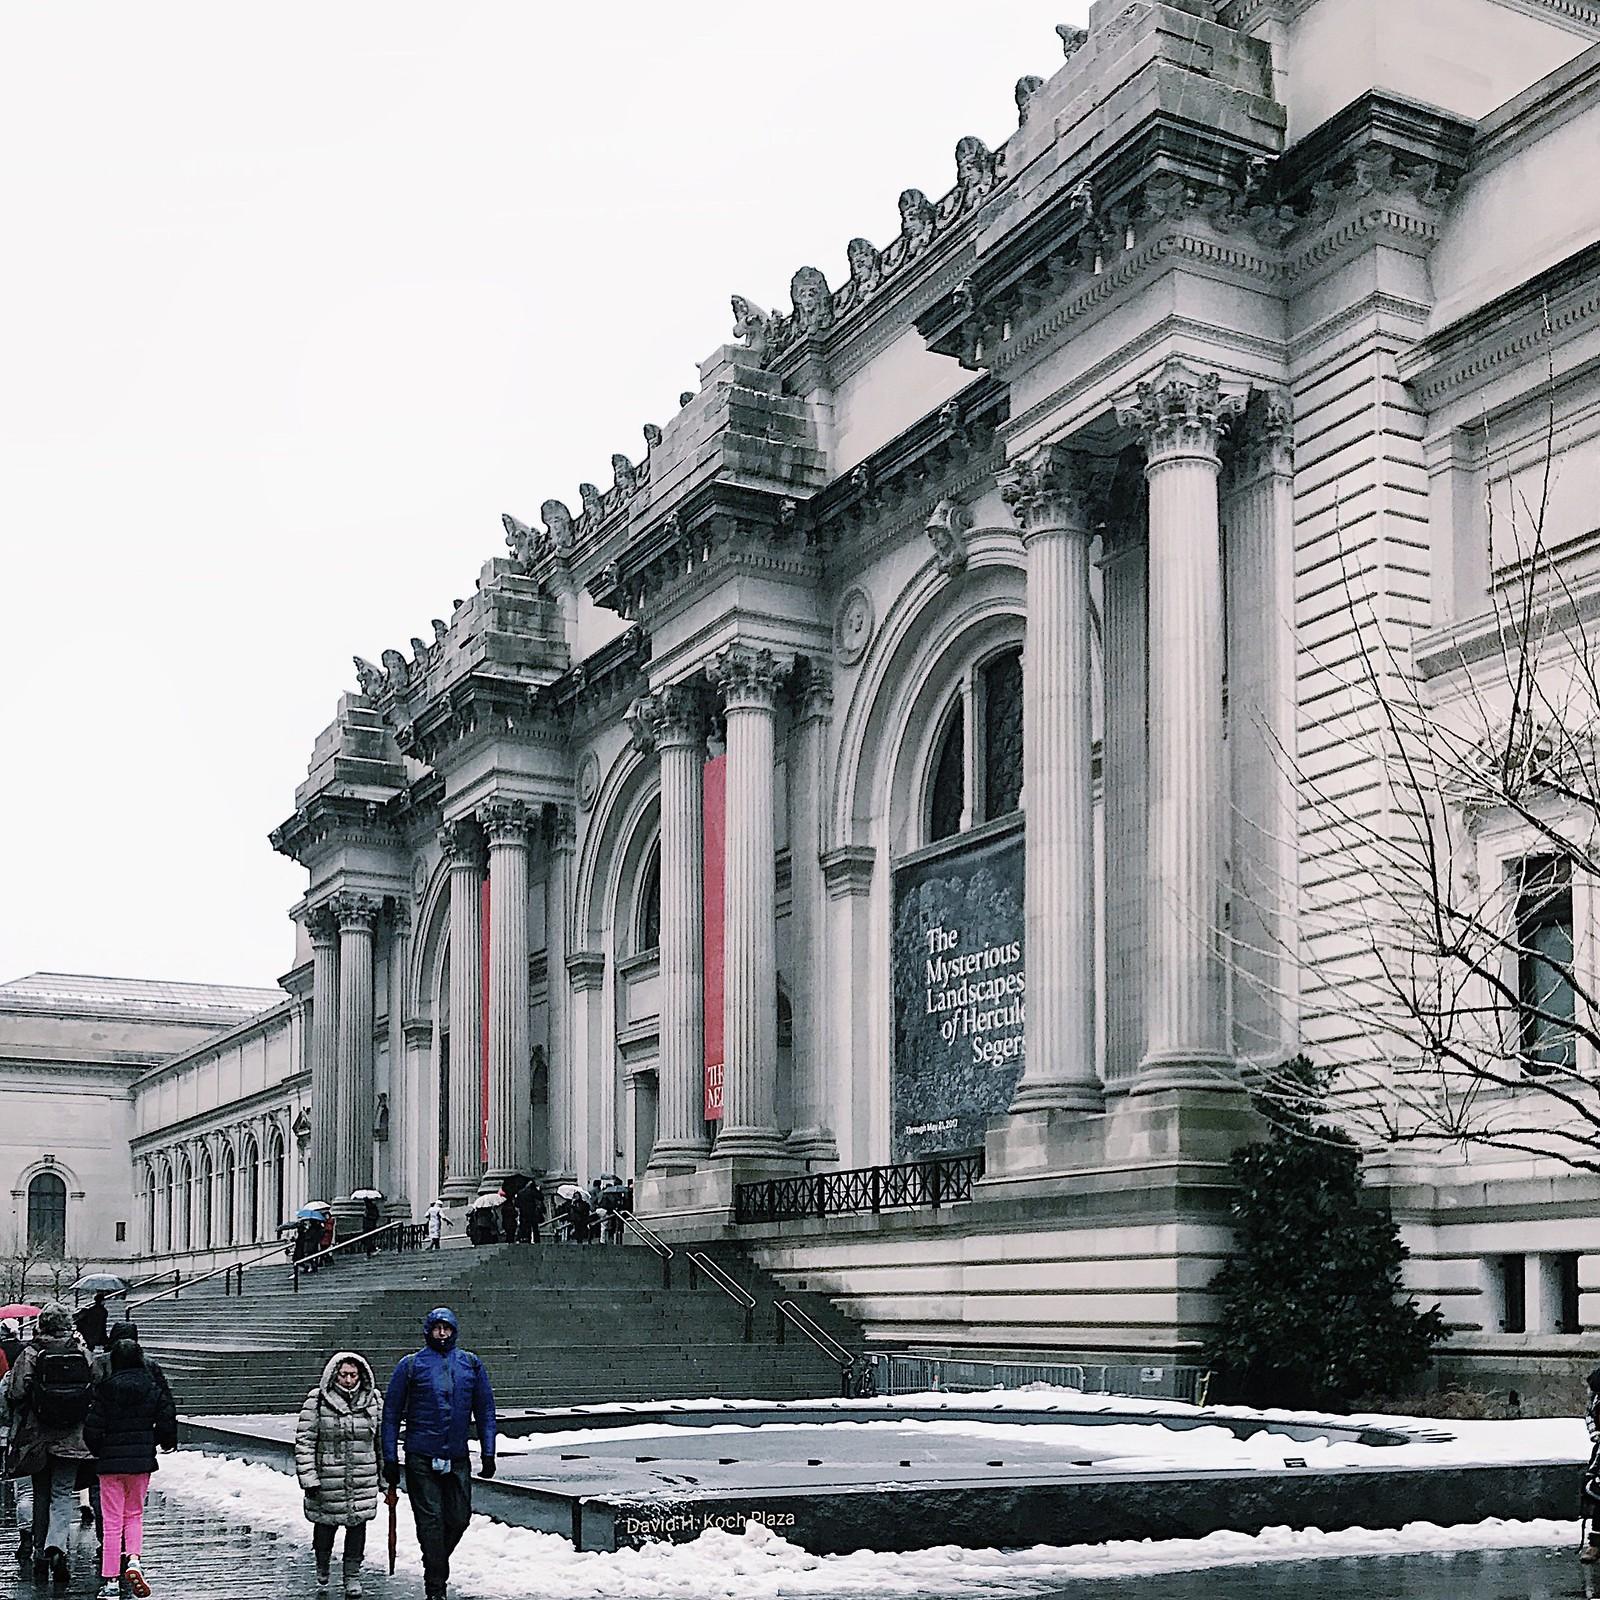 1618-metropolitanmuseum-metmuseum-metropolitan-nyc-newyork-nyfw-newyorkfashionweek-newyorkcity-clothestoyouuu-elizabeeetht